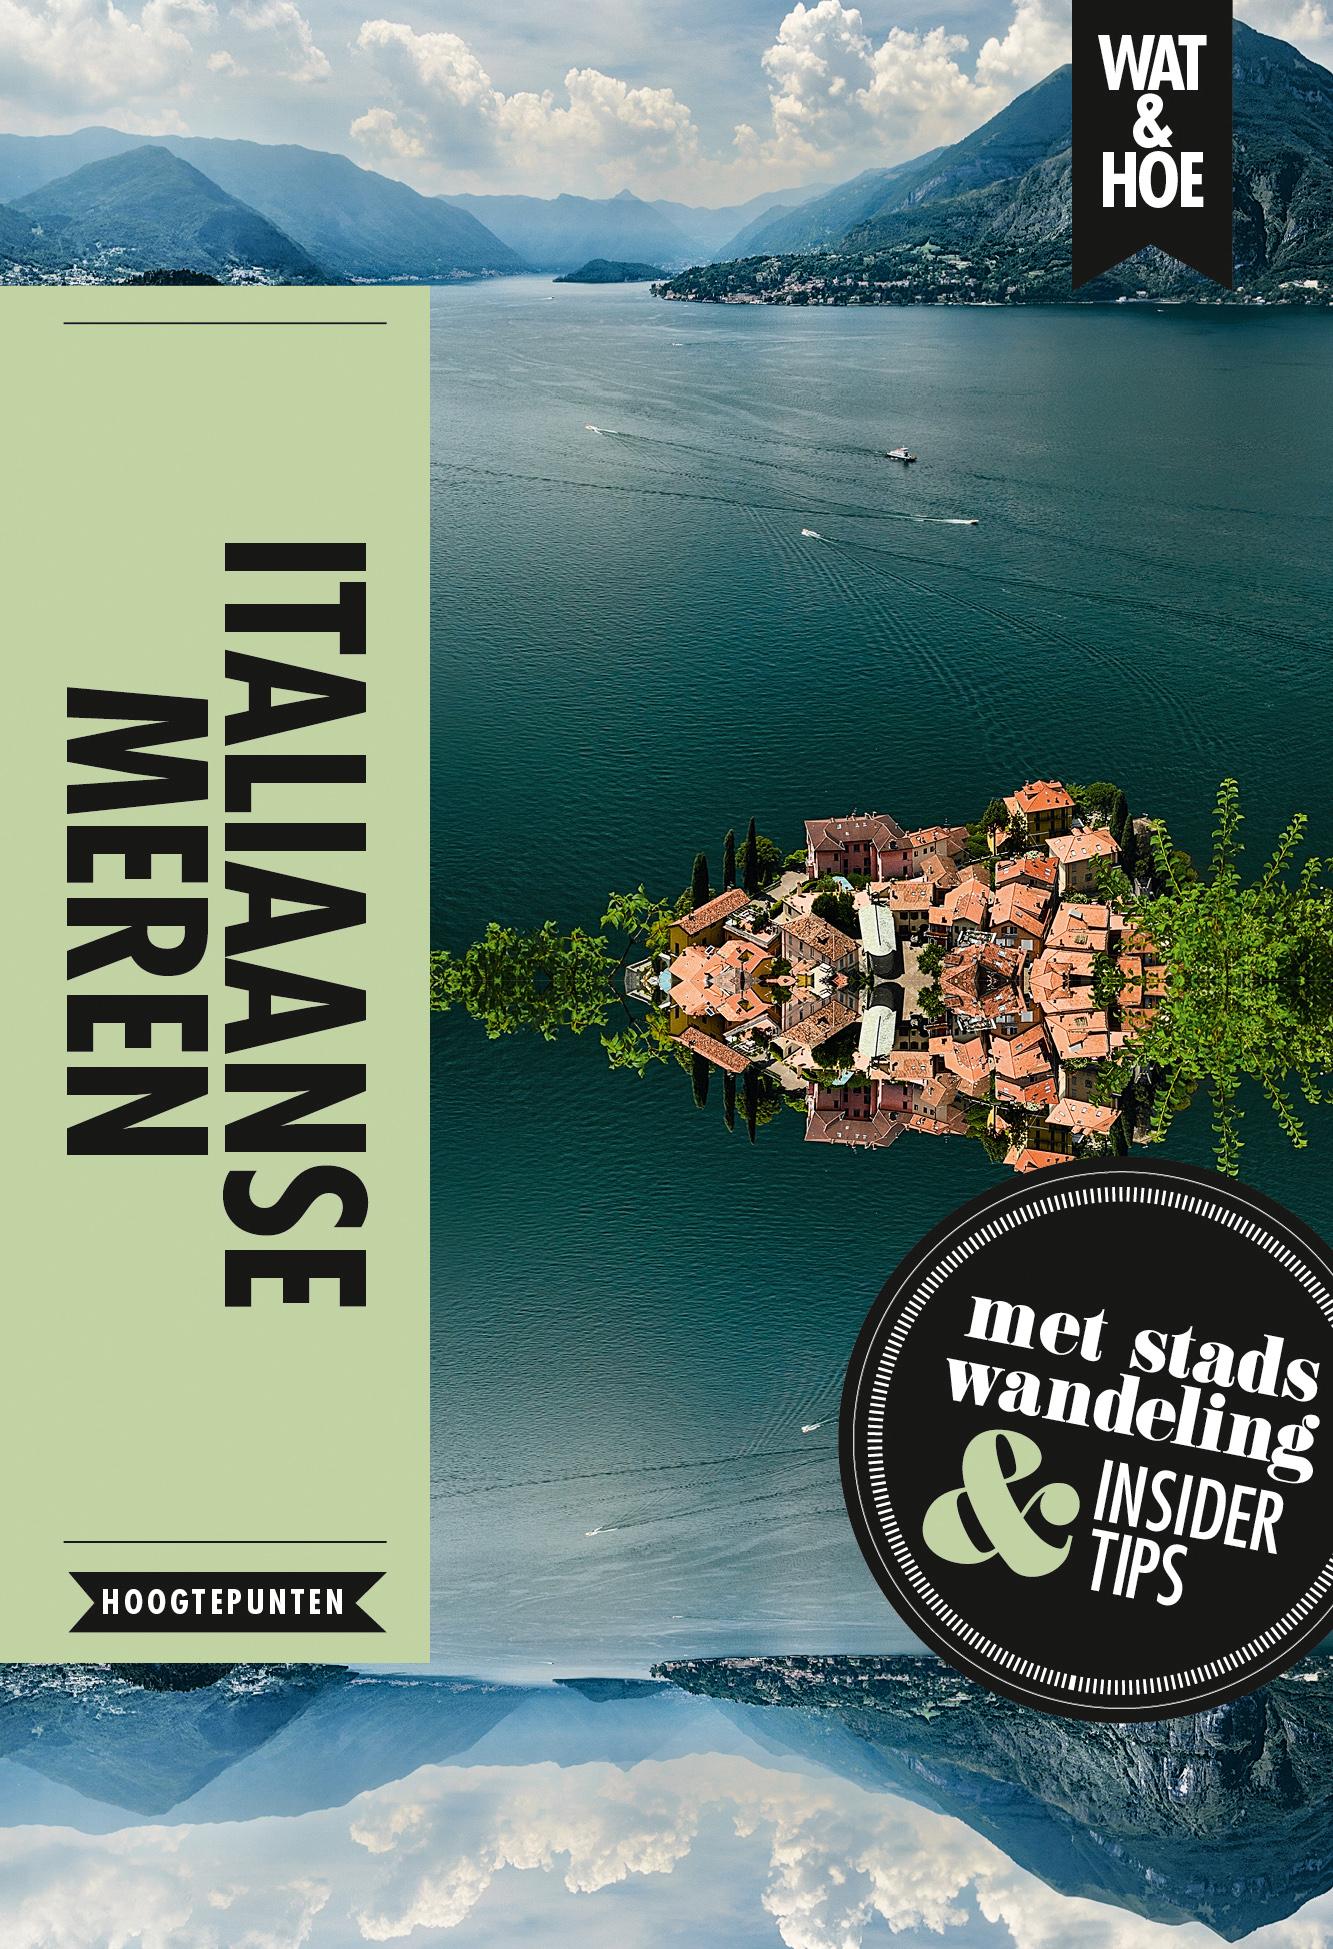 Reisgids Wat & Hoe Hoogtepunten Italiaanse meren   Kosmos Uitgevers  €9,99